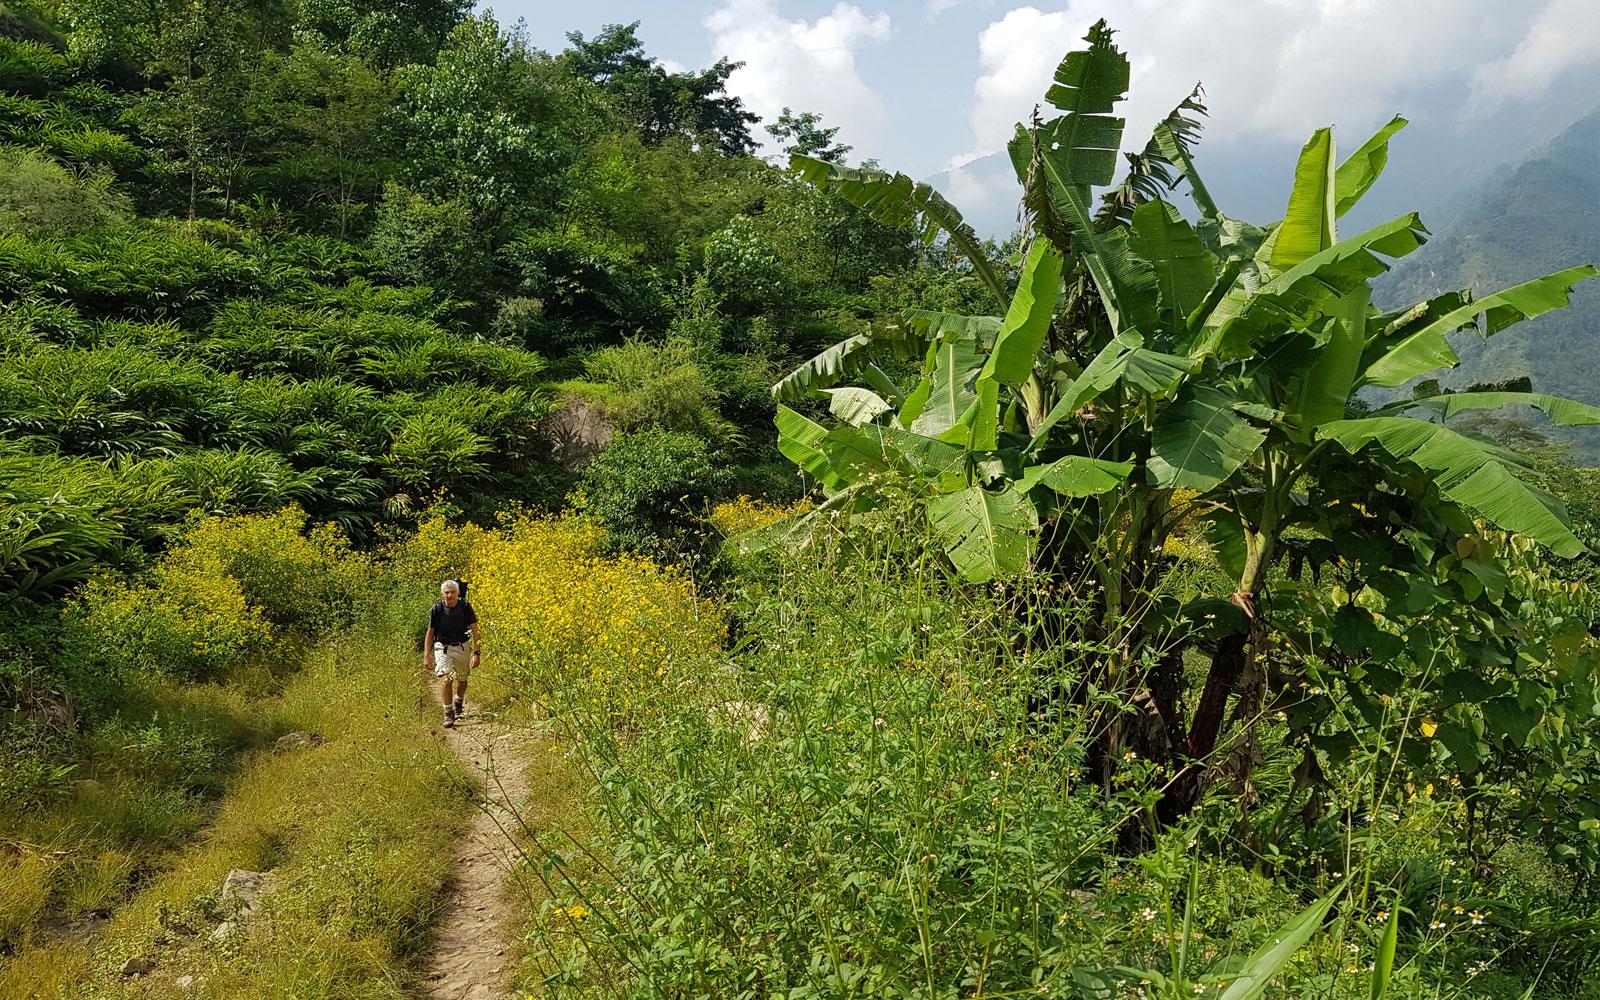 Paysage du trek Lumba Sumba dans le Kangchenjunga au départ